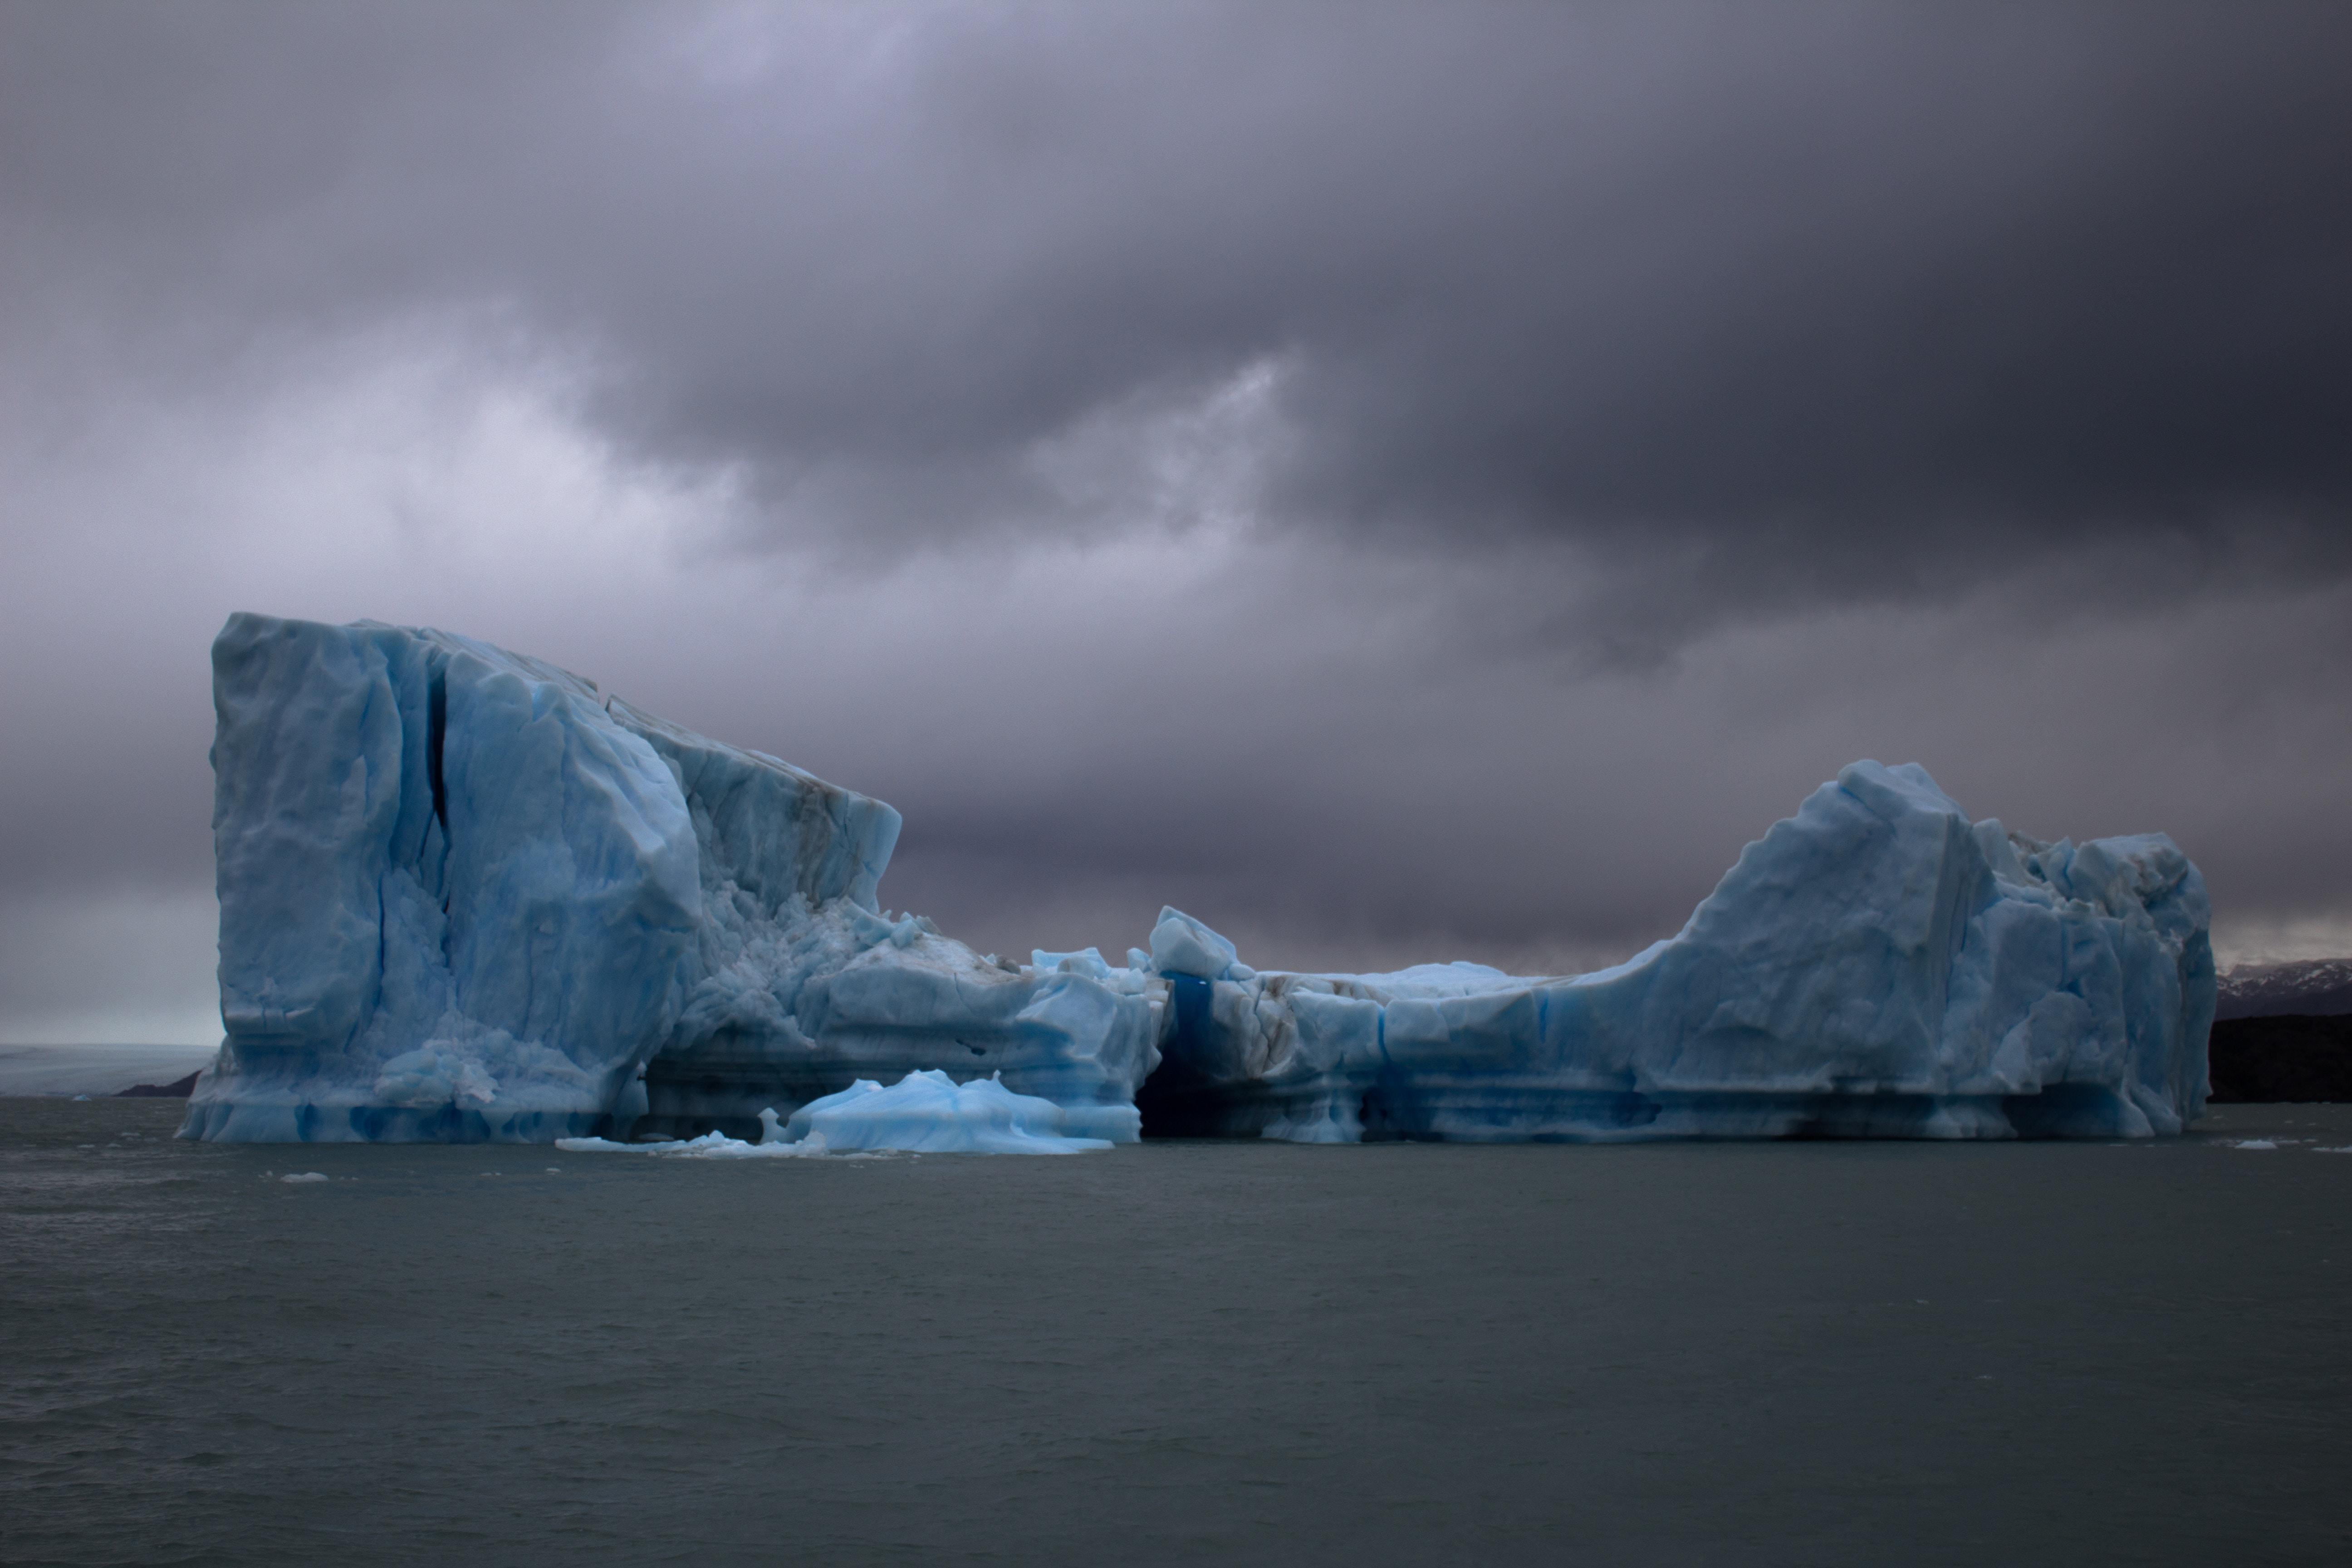 iceberg on body of water